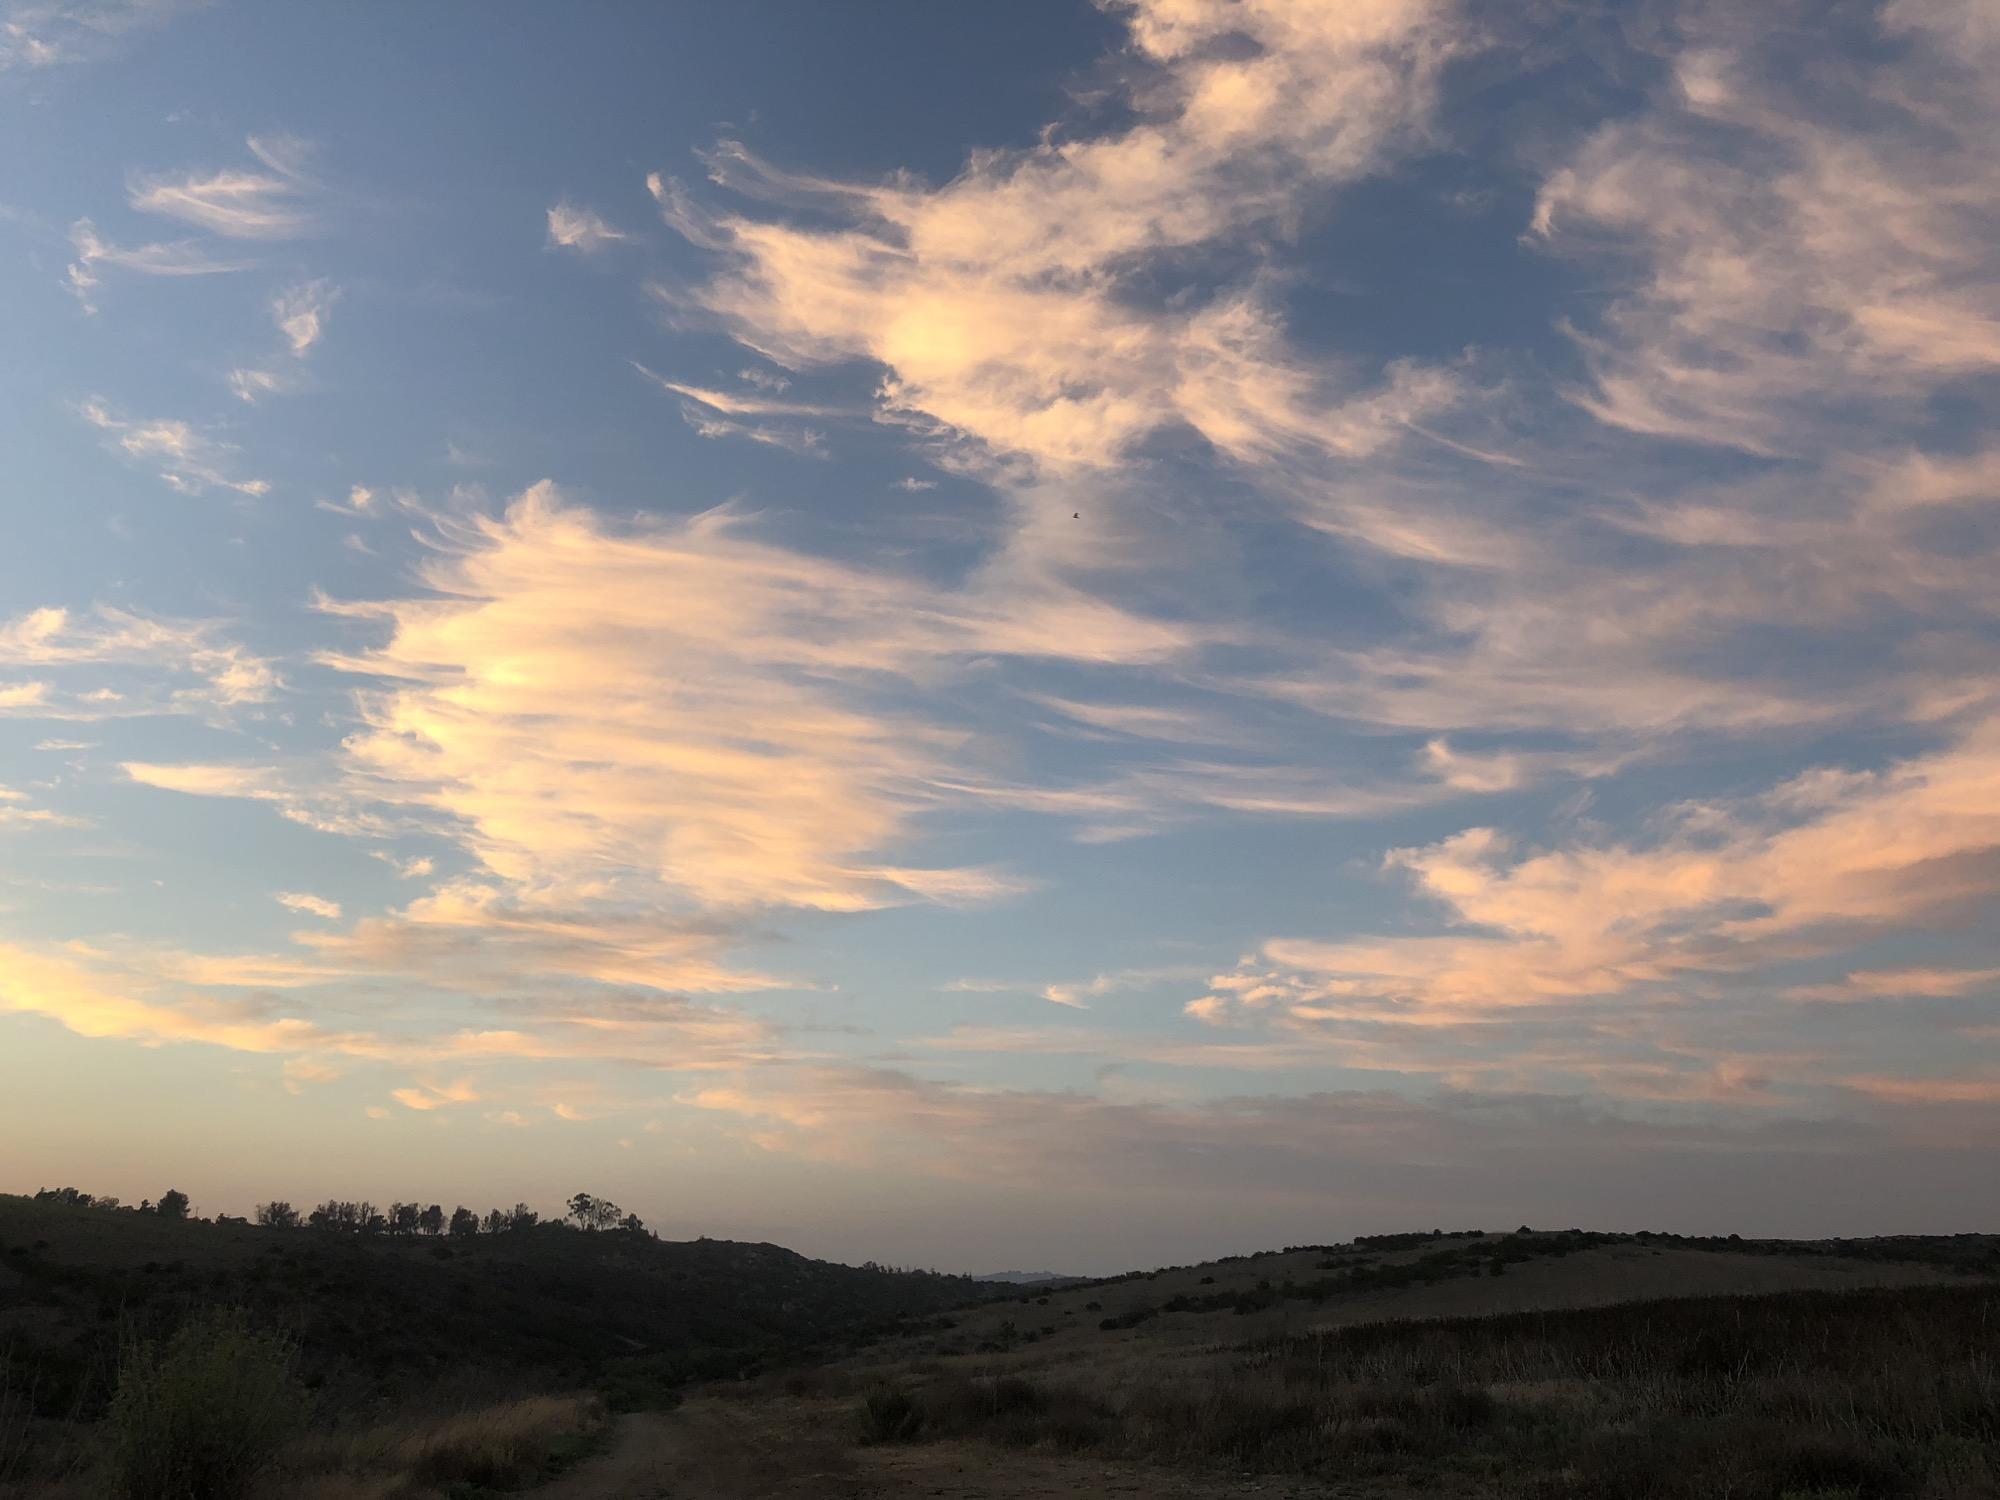 God painted the sky tonight